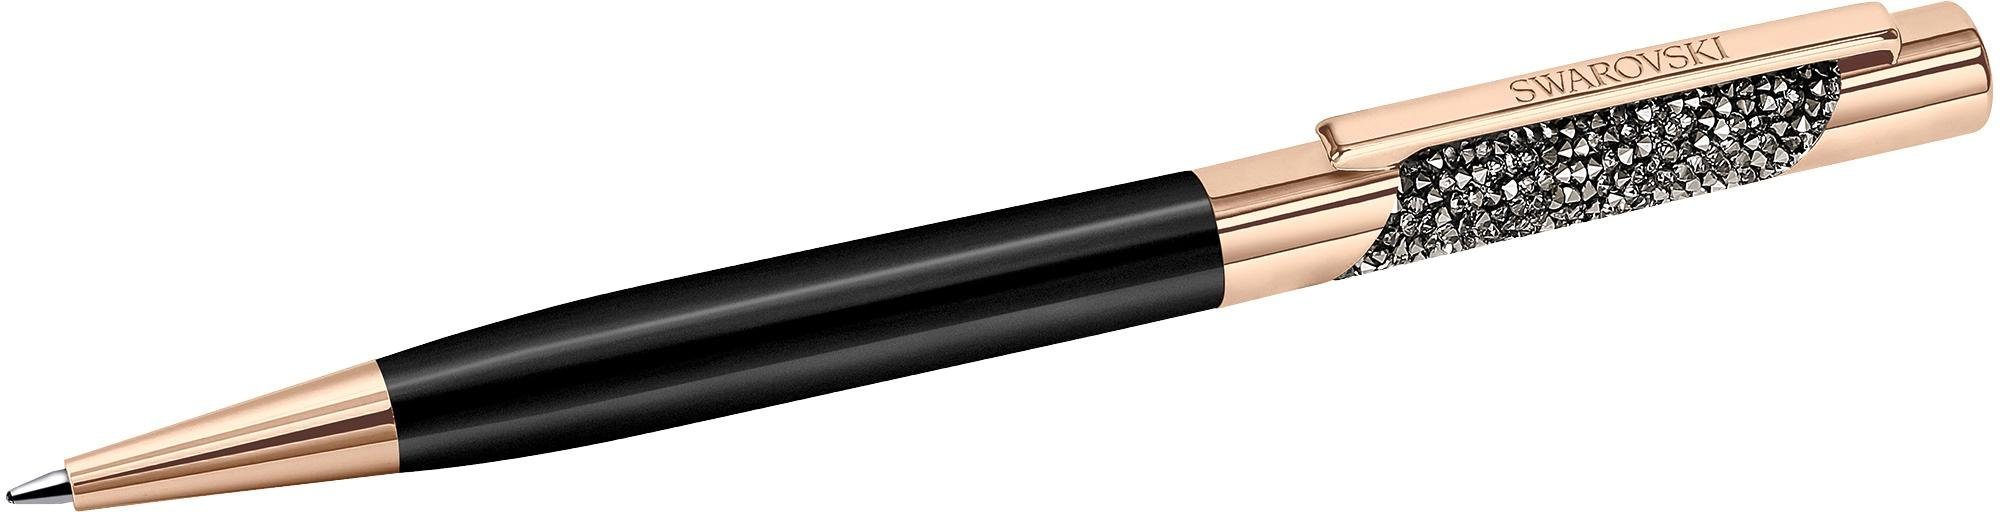 Swarovski Kugelschreiber, »Eclipse Ballpoint Pen, Rose Gold Plated Black, 5285949«